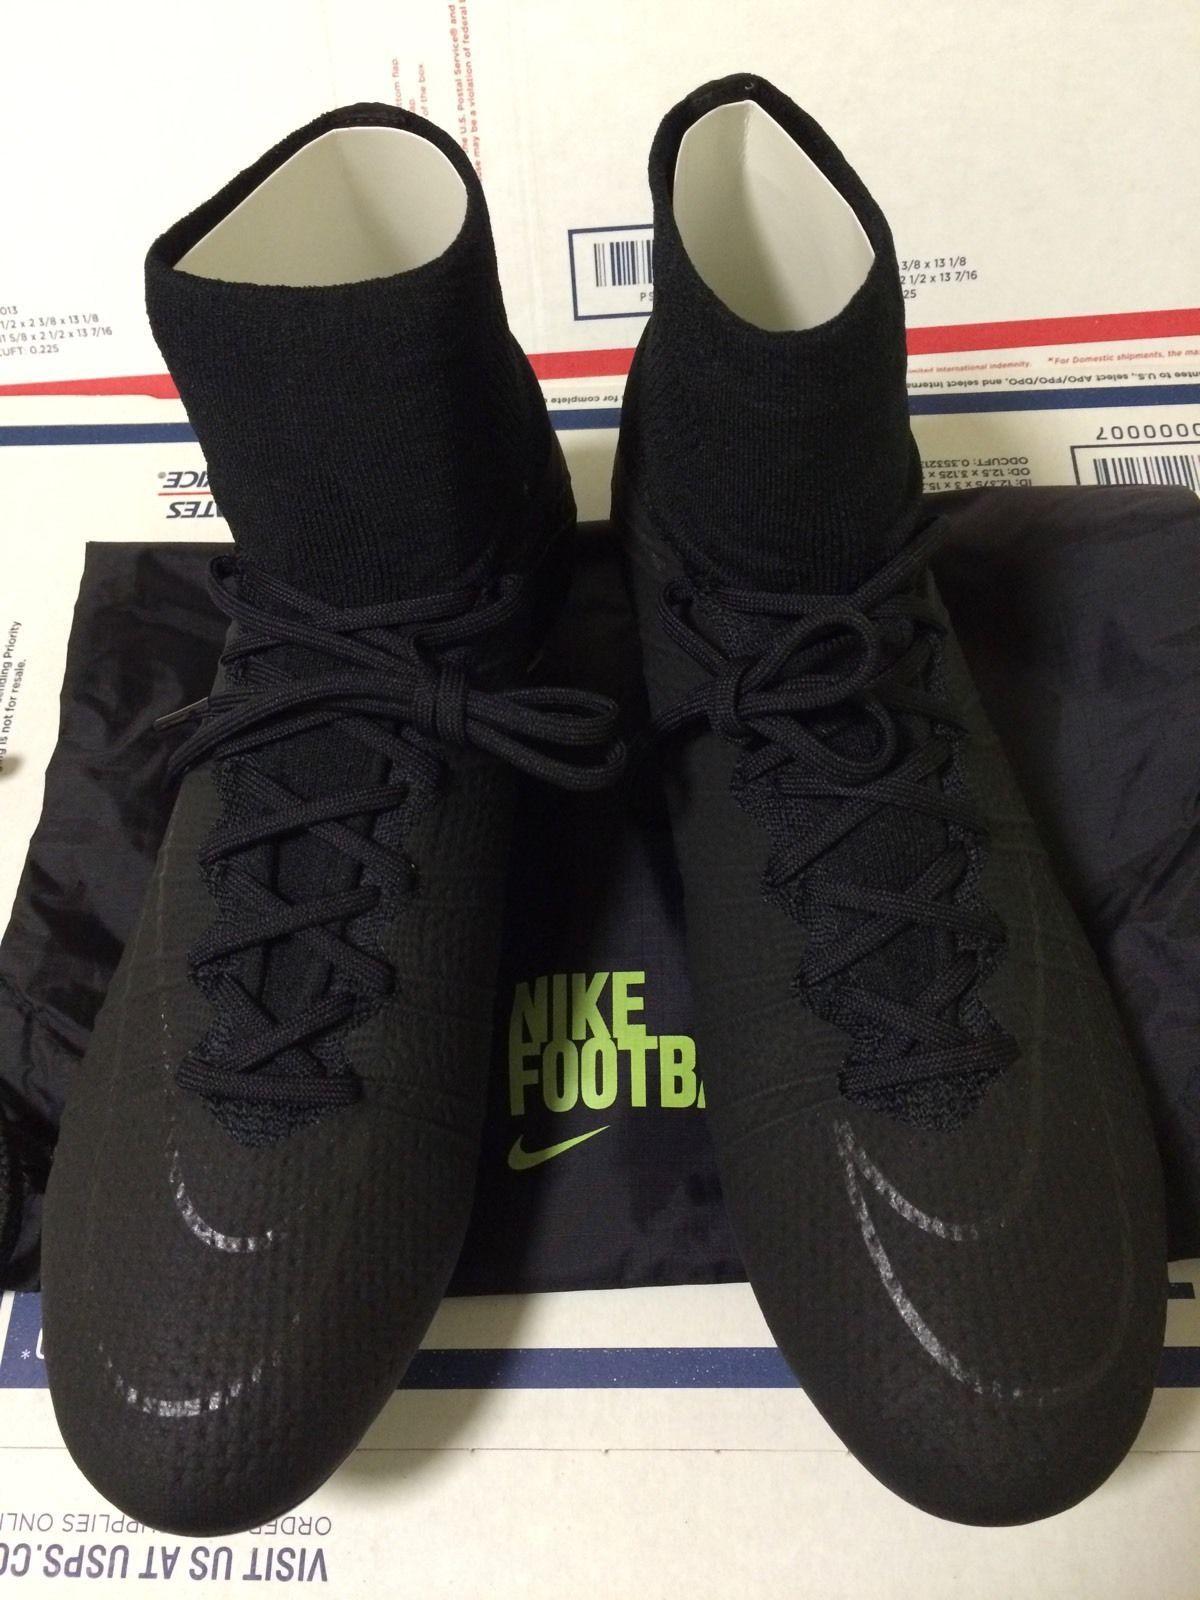 Nike Mercurial Vapor Superfly IV FG - Soccer - Cleats - Academy Pack -  Blackout 37057fce0ee